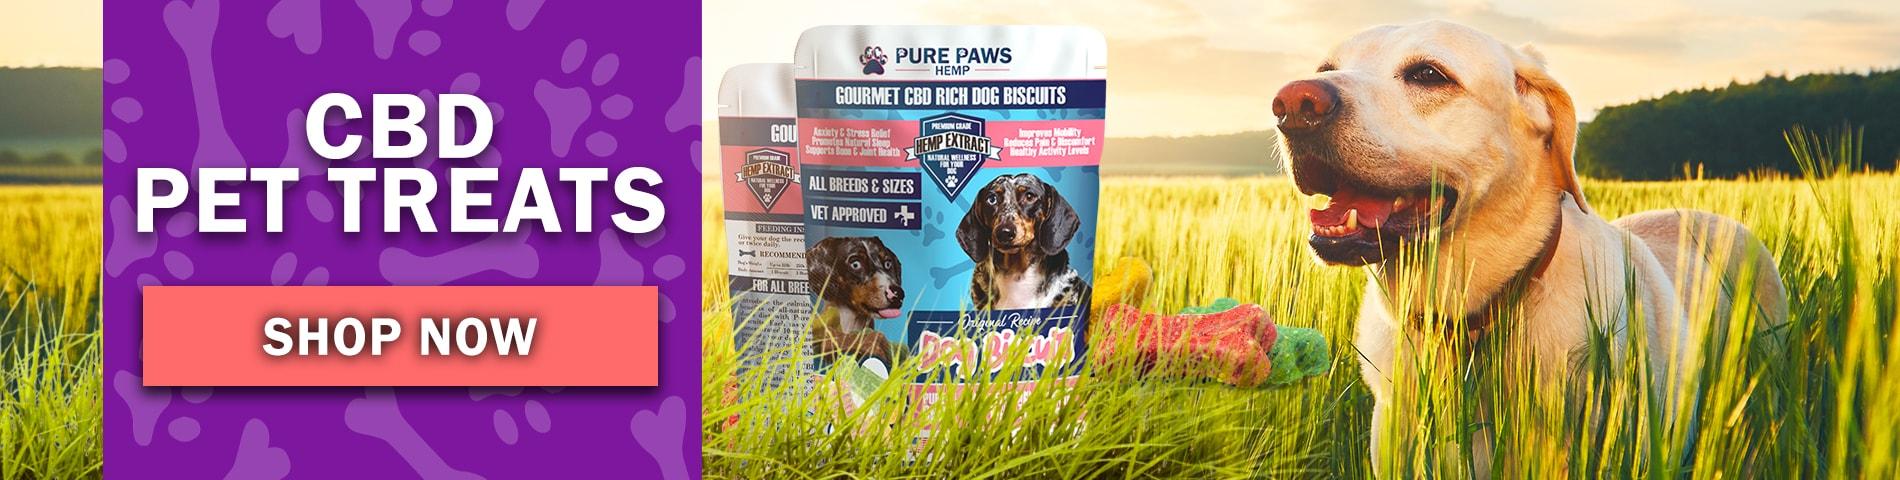 Pure Paws Hemp CBD Dog Biscuits